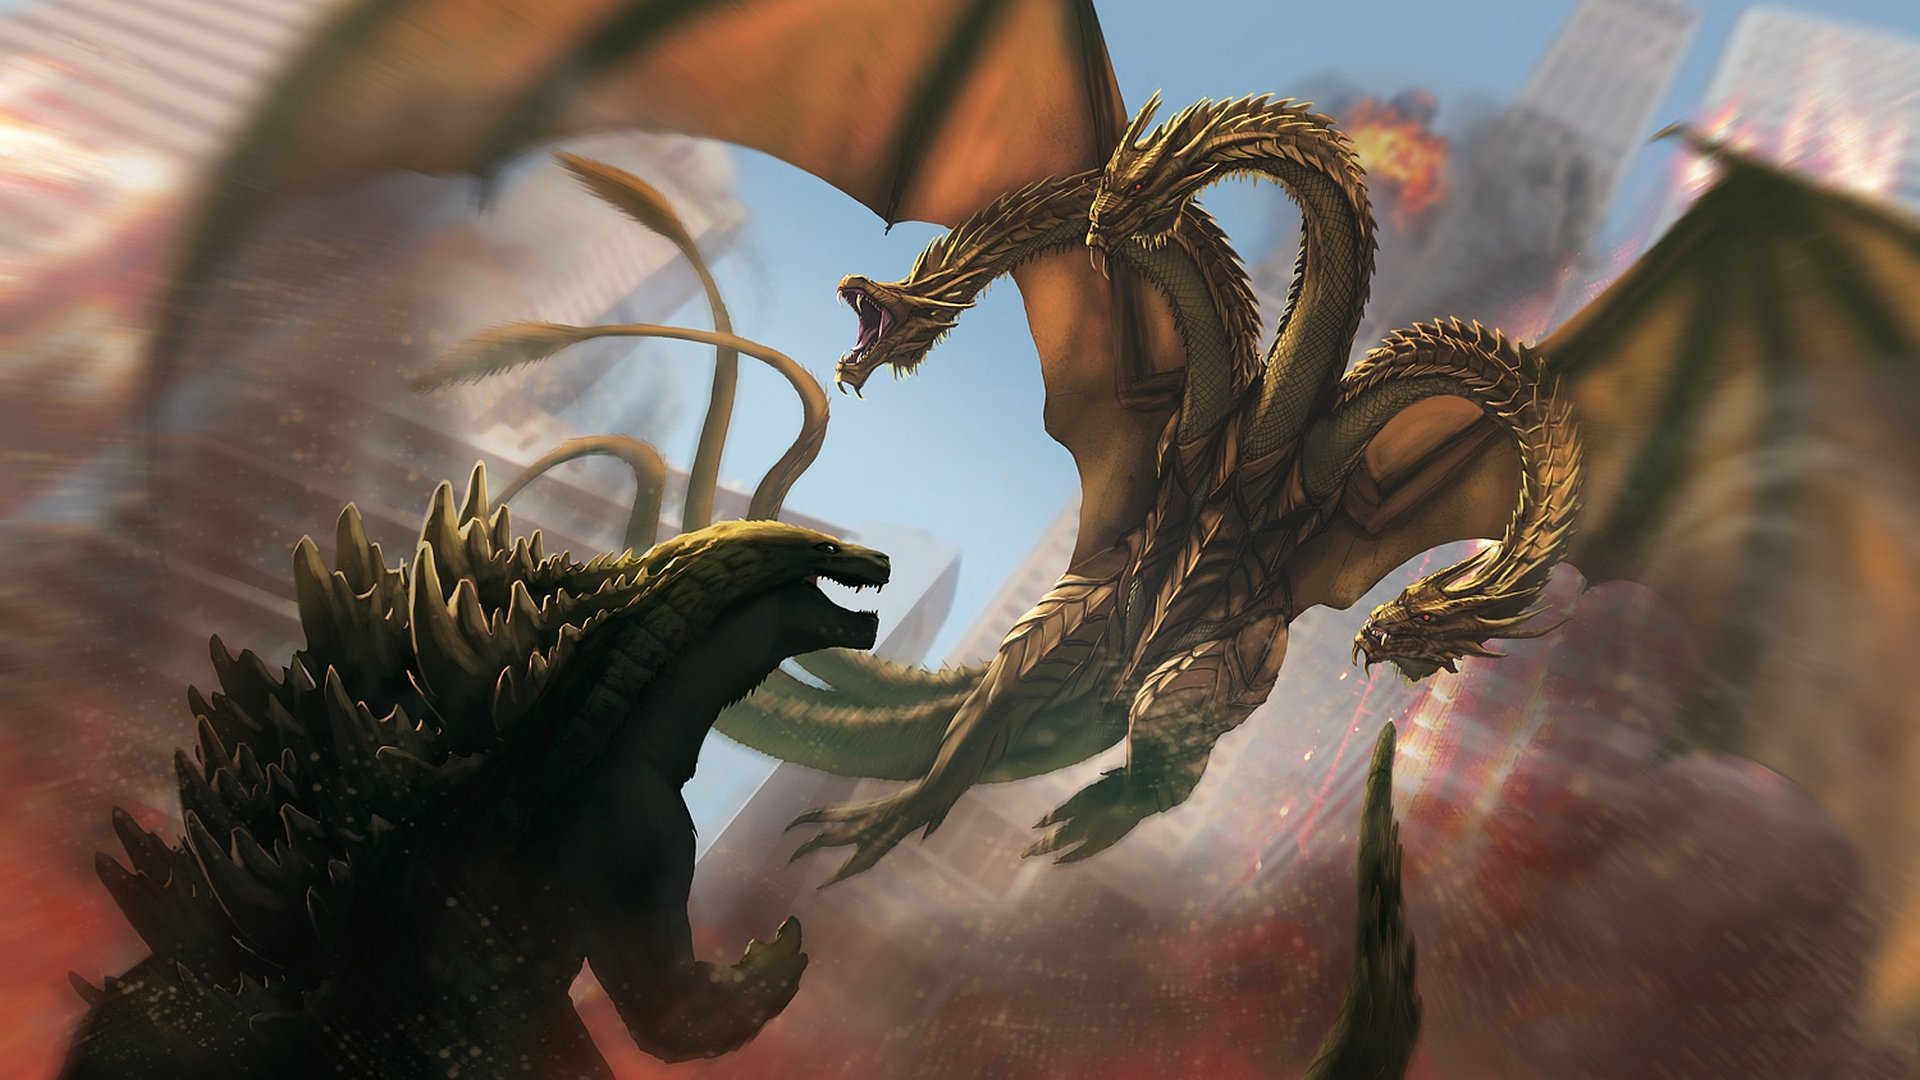 Ghidorah the Three Headed Monster HD Wallpaper Background Image 1920x1080